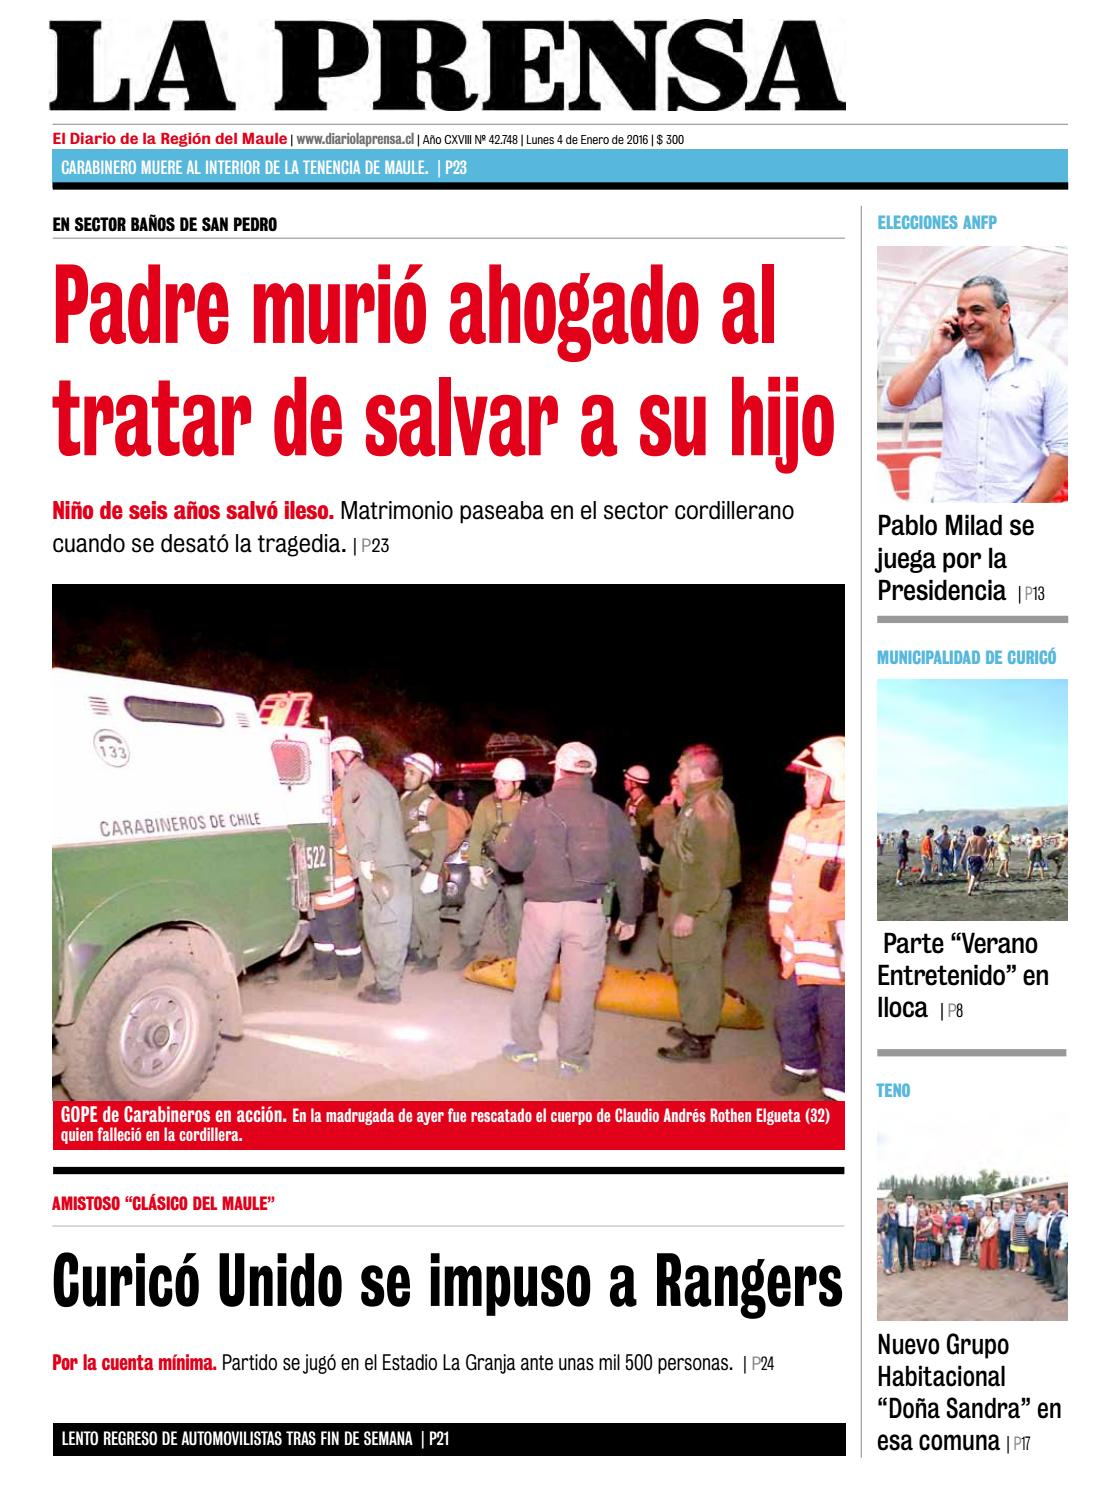 Diario 01 12 2010 By Diario El Centro S A Issuu # Muebles Tamara Fox Rancagua